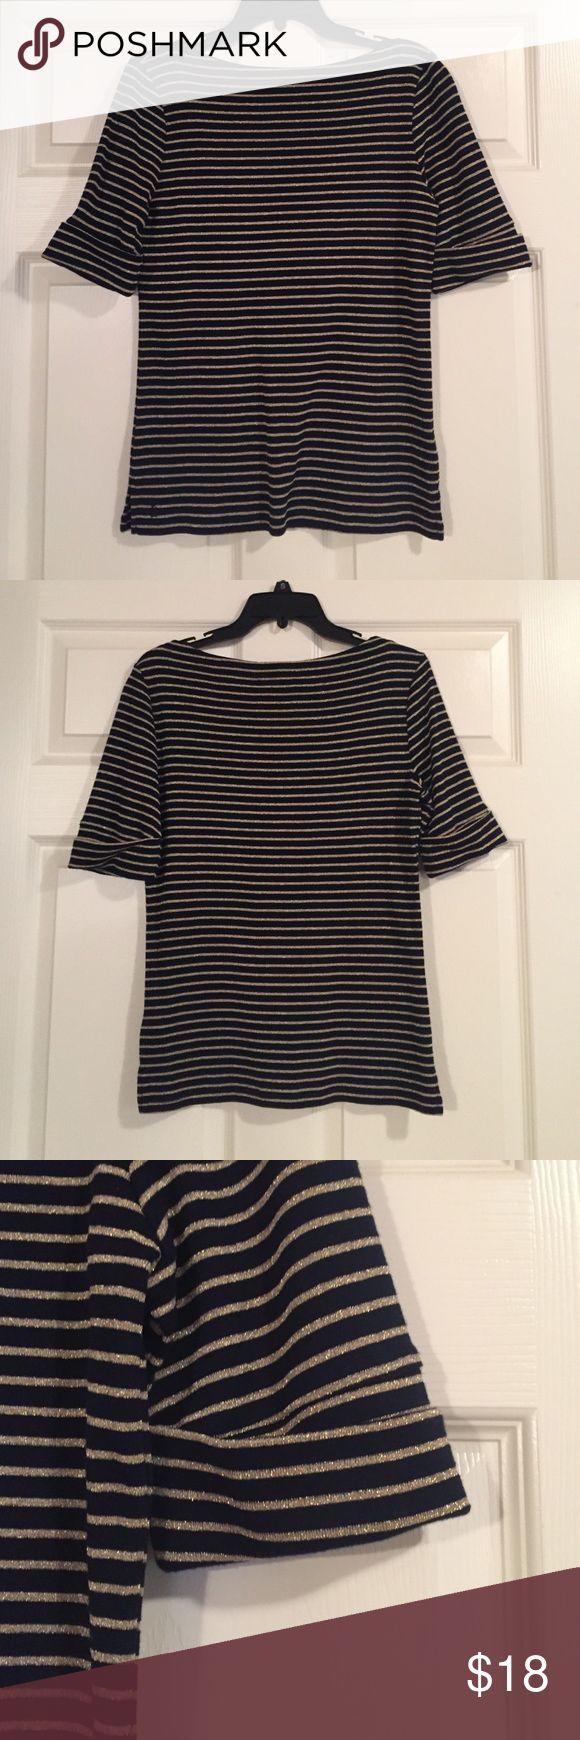 Blouse *Ralph Lauren brand *Ralph Lauren blouse. Cute cupped sleeves. Boat neckline. Black and Gold stripe pattern. Lauren Ralph Lauren Tops Blouses